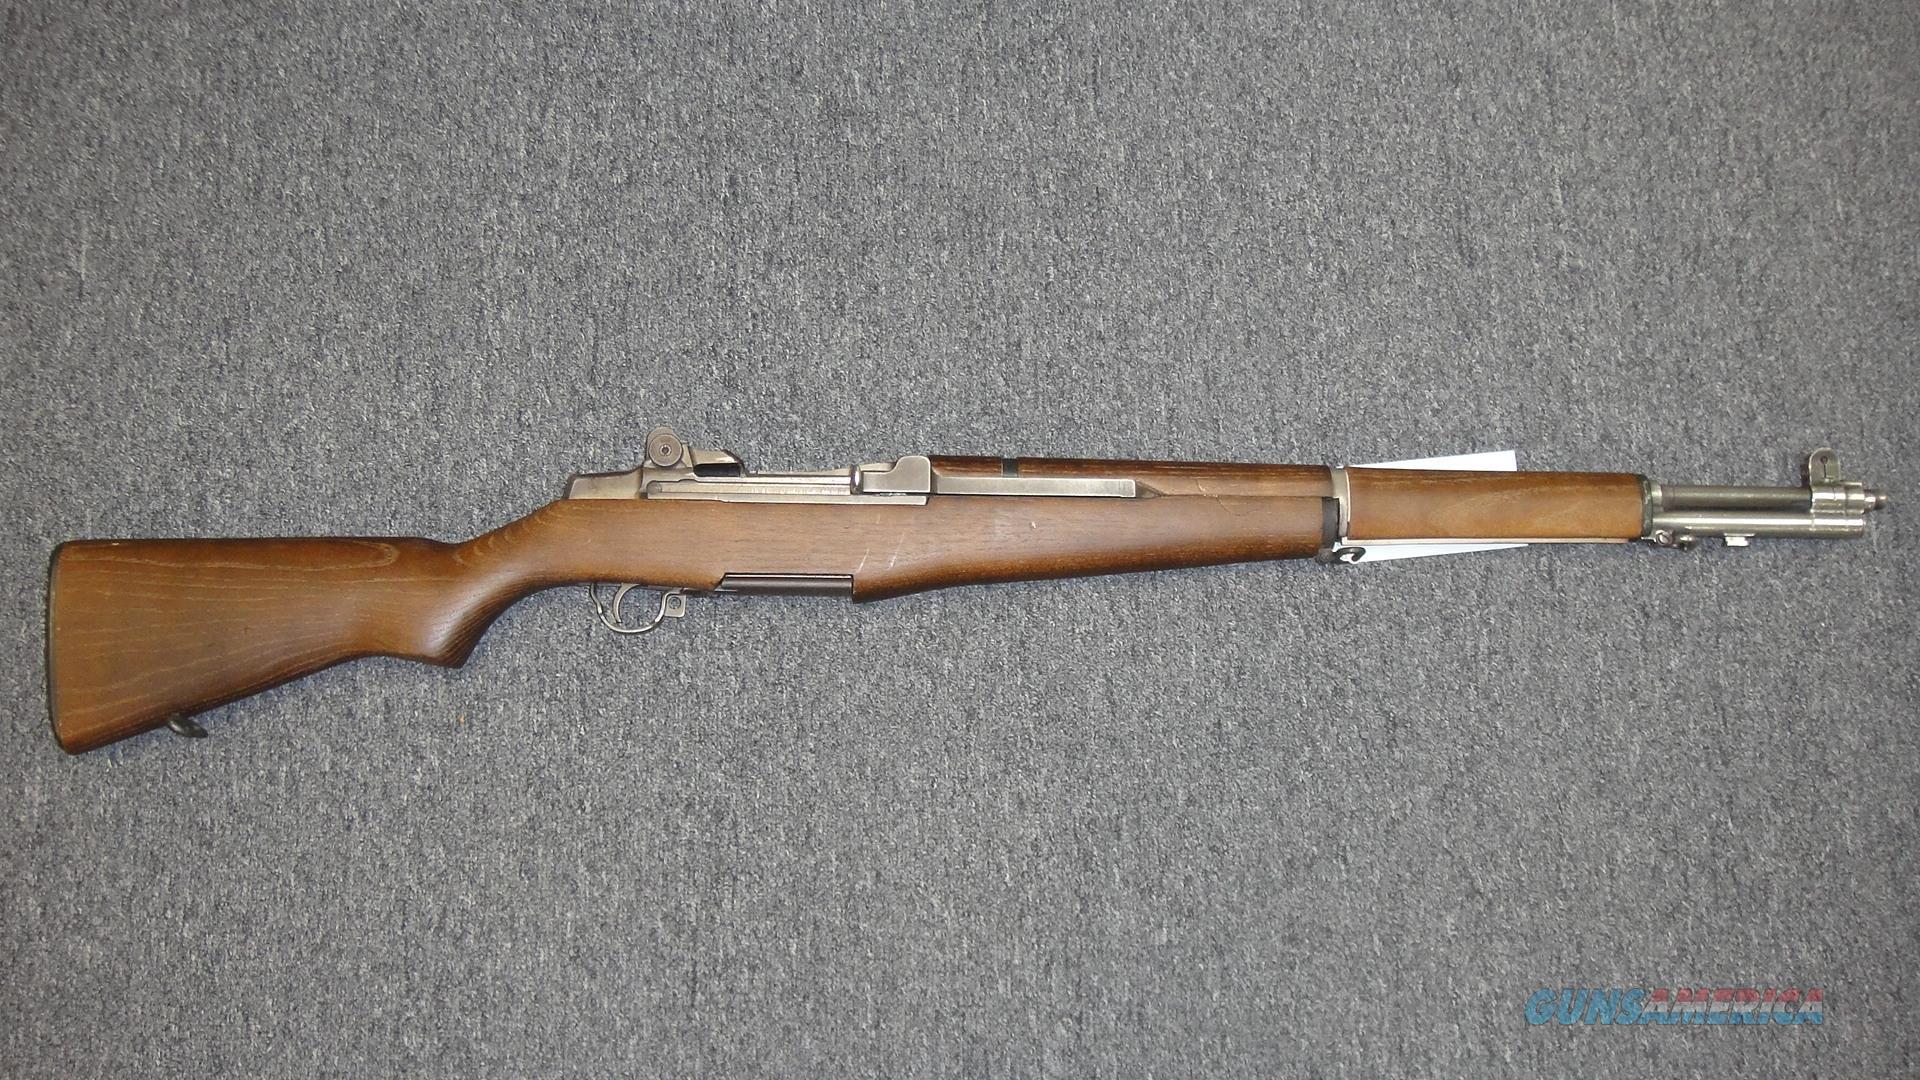 Springfield Armory M1 Garand (CMP)  Guns > Rifles > Springfield Armory Rifles > M1 Garand